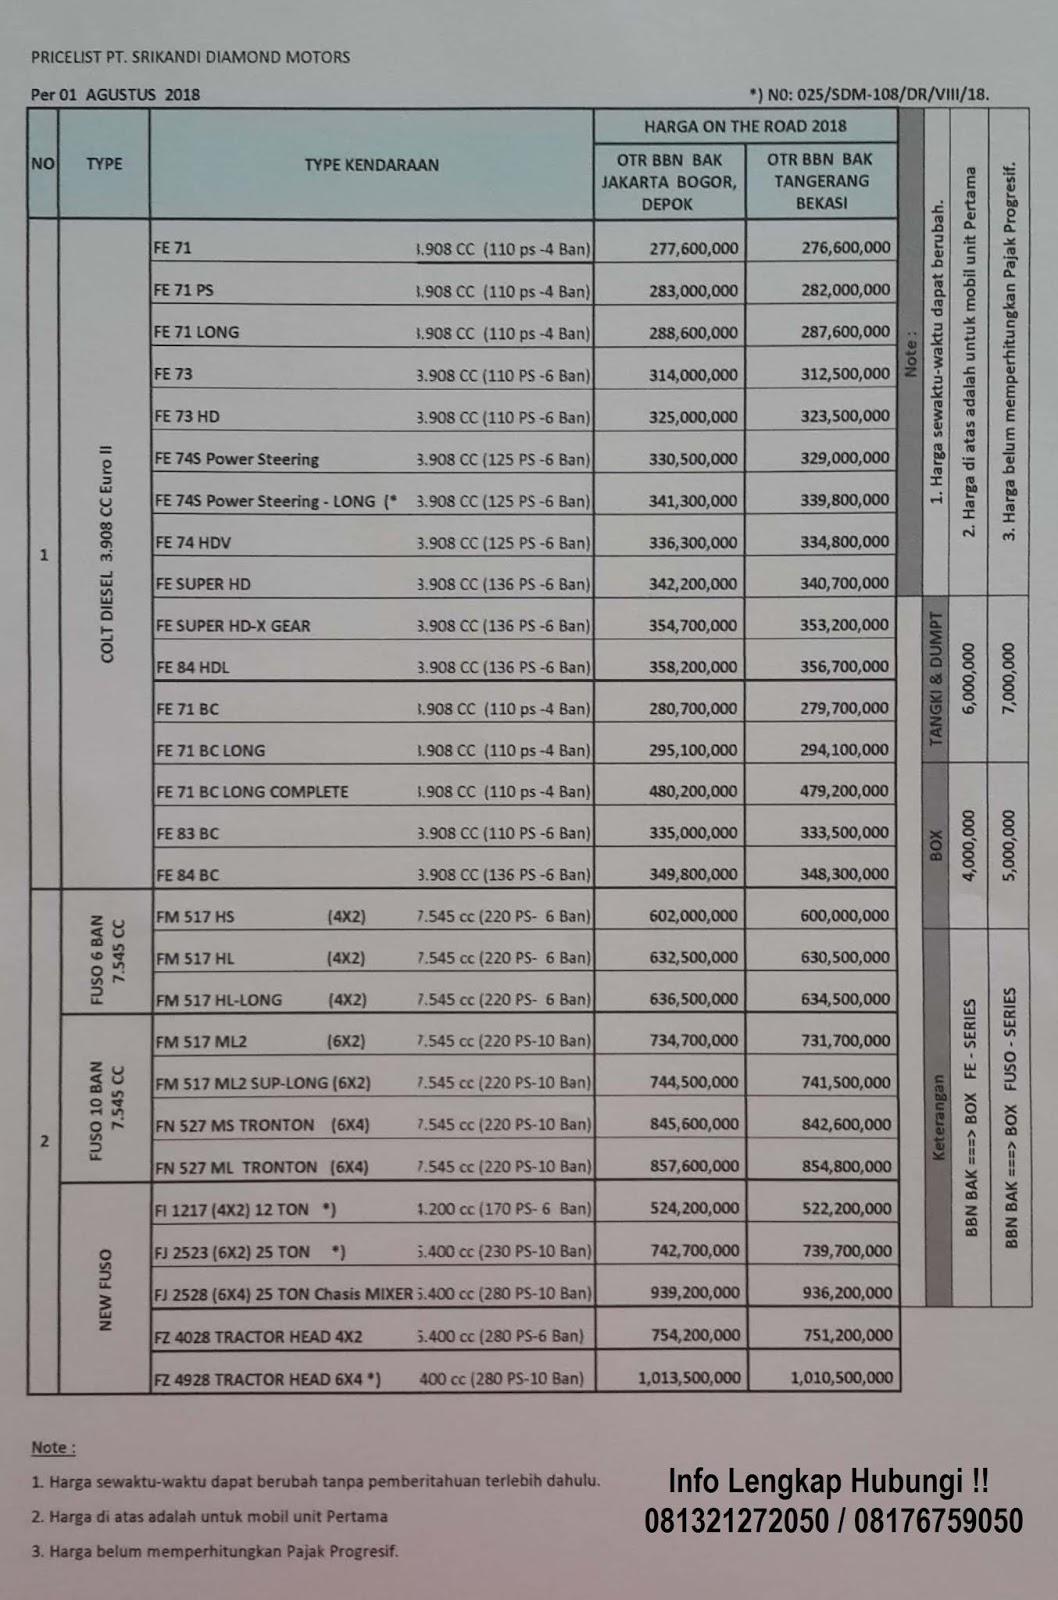 all new camry 2017 indonesia harga spesifikasi lengkap kijang innova mobil baru colt l300 pick up box alumunium